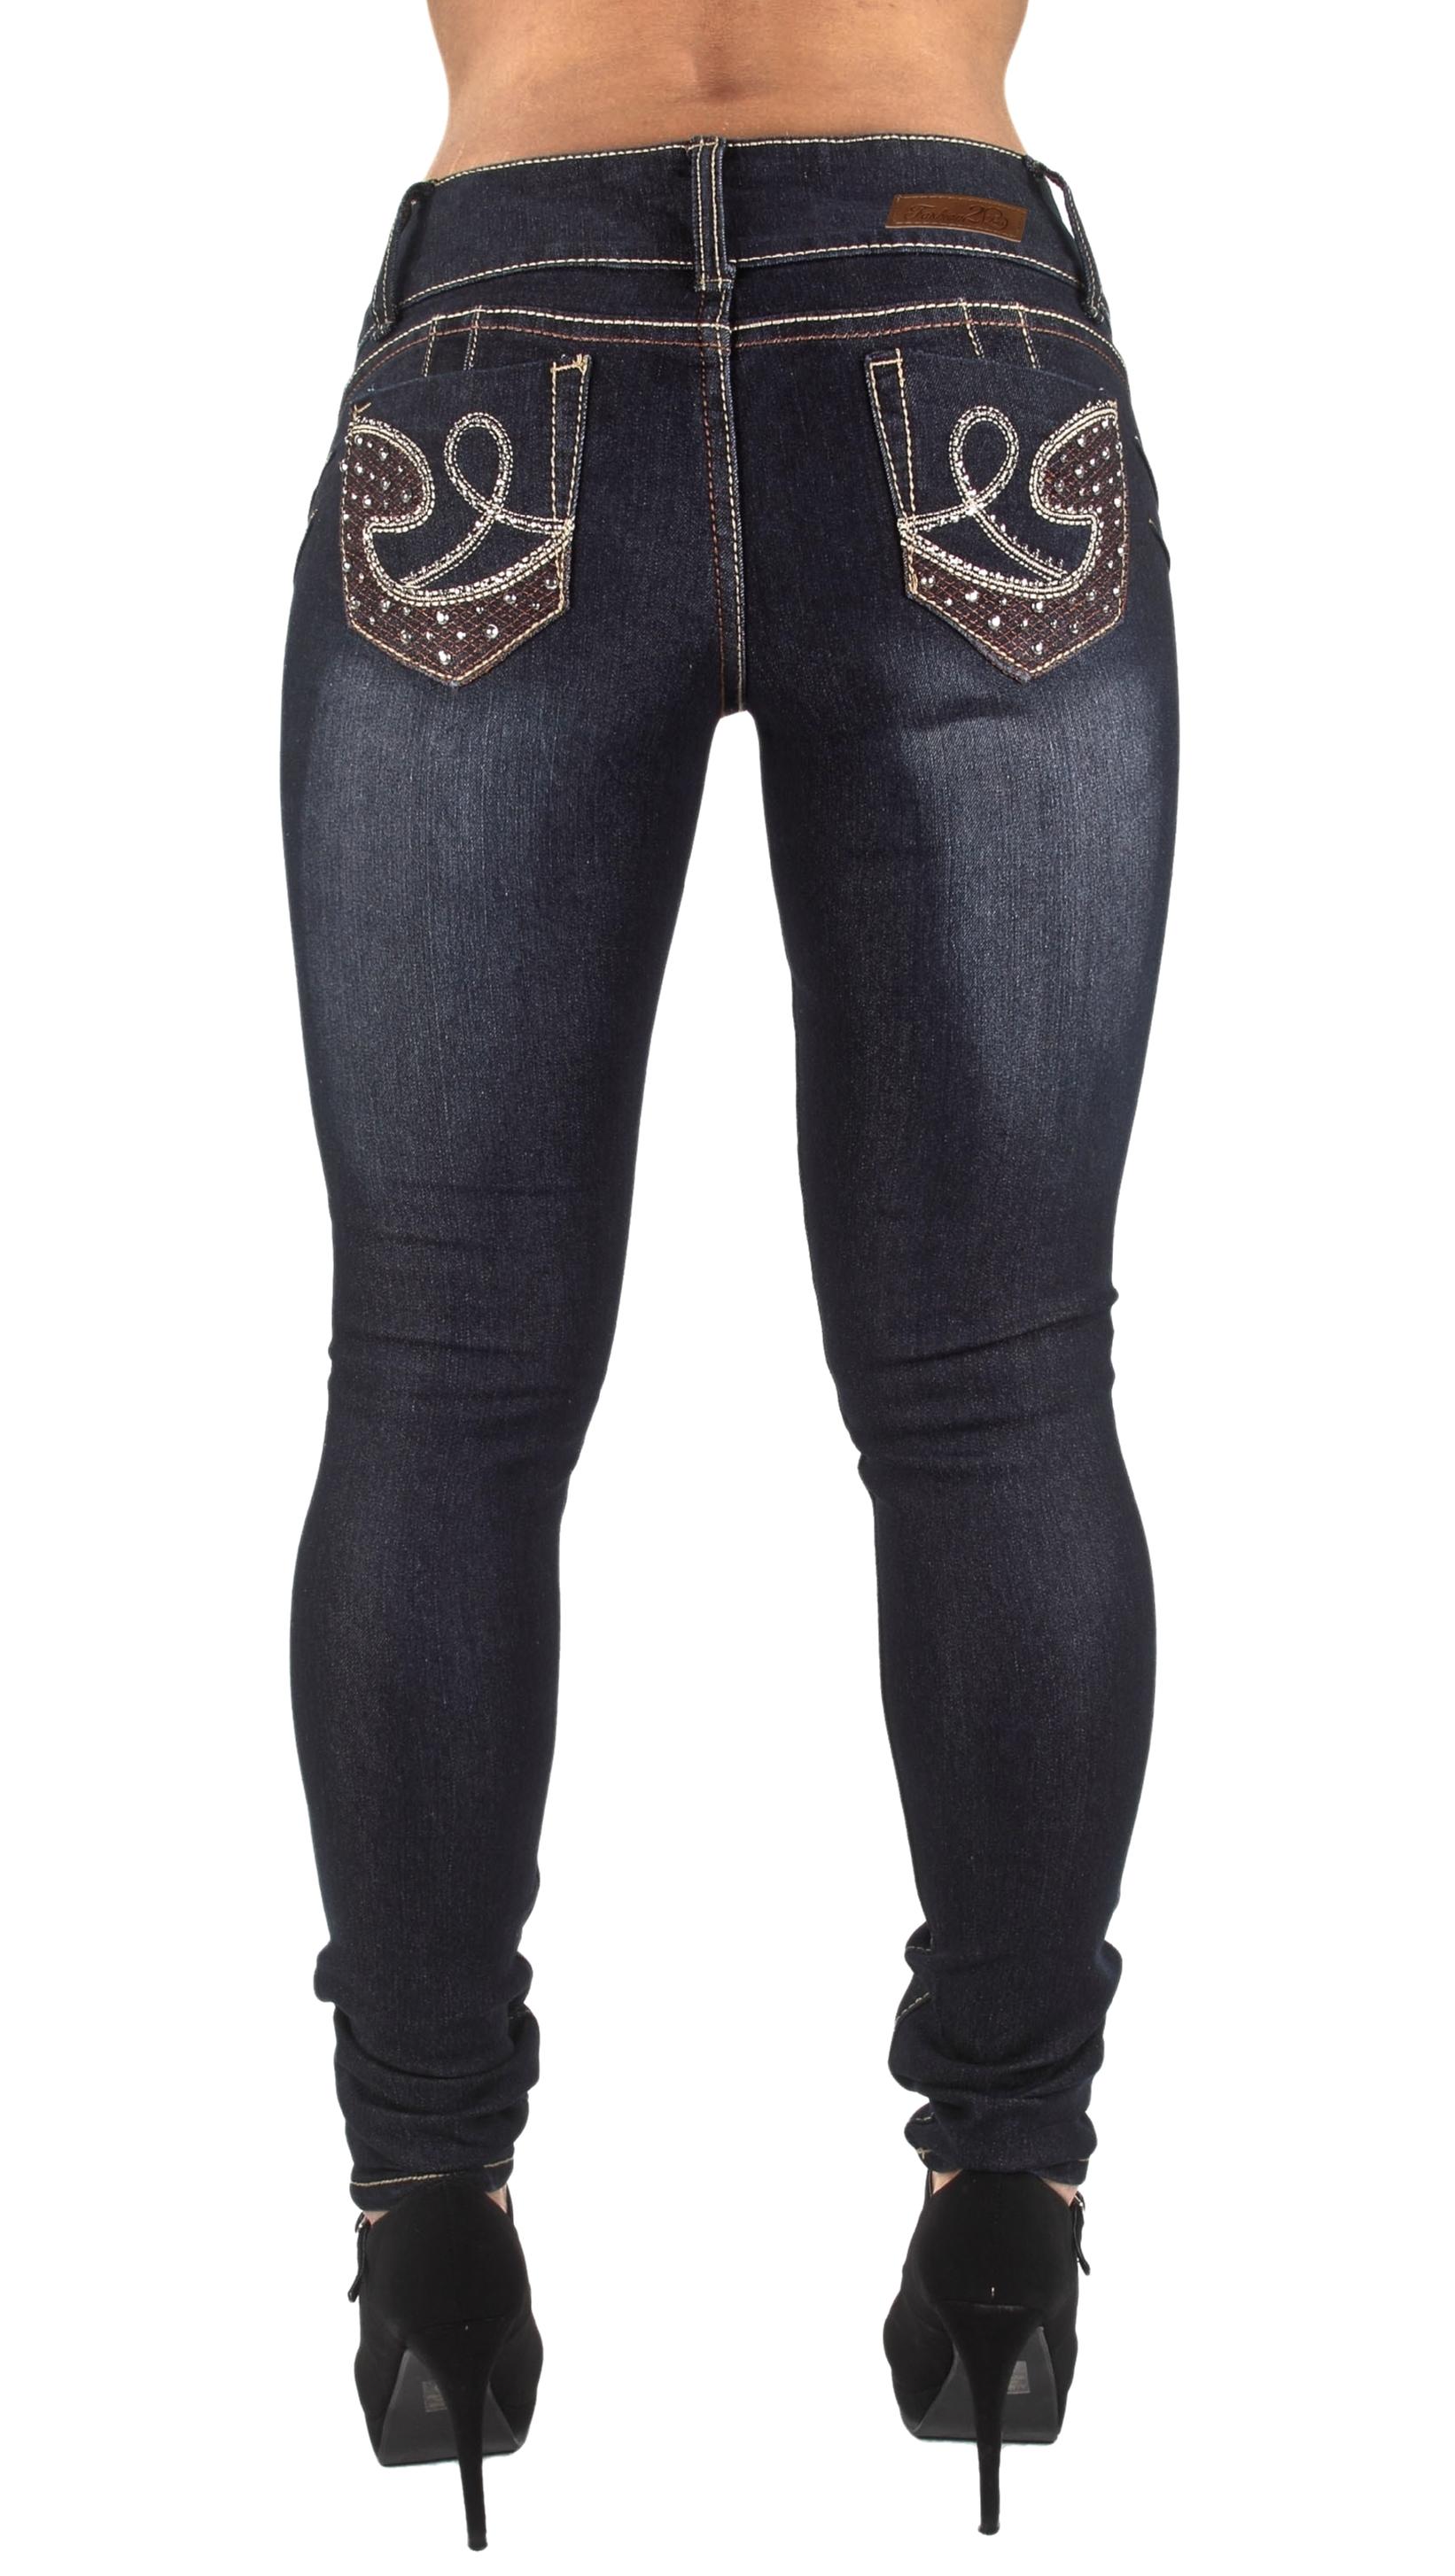 Plus Size High Waist Skinny Leg Jeans Butt Lifting